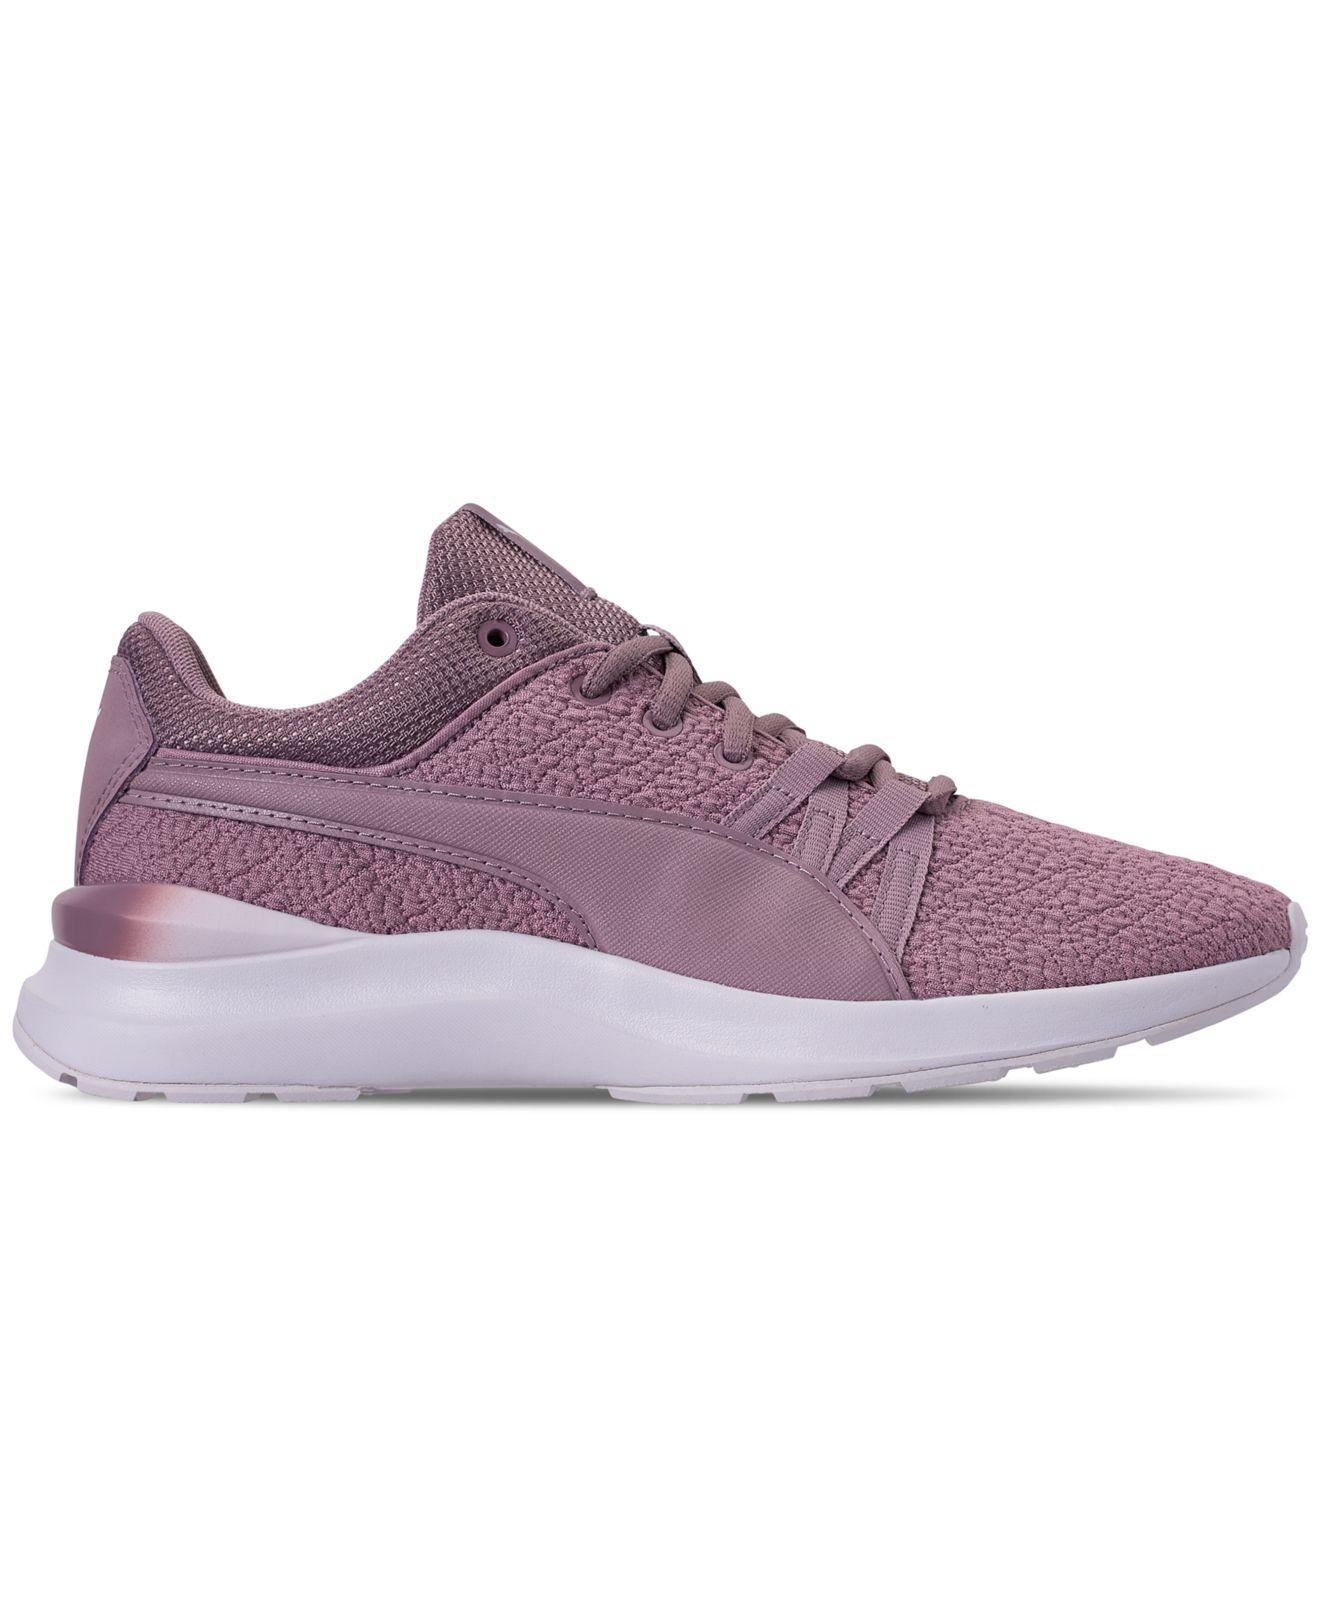 Lyst - PUMA Adela Gradient Casual Sneakers From Finish Line in Purple 457da2179